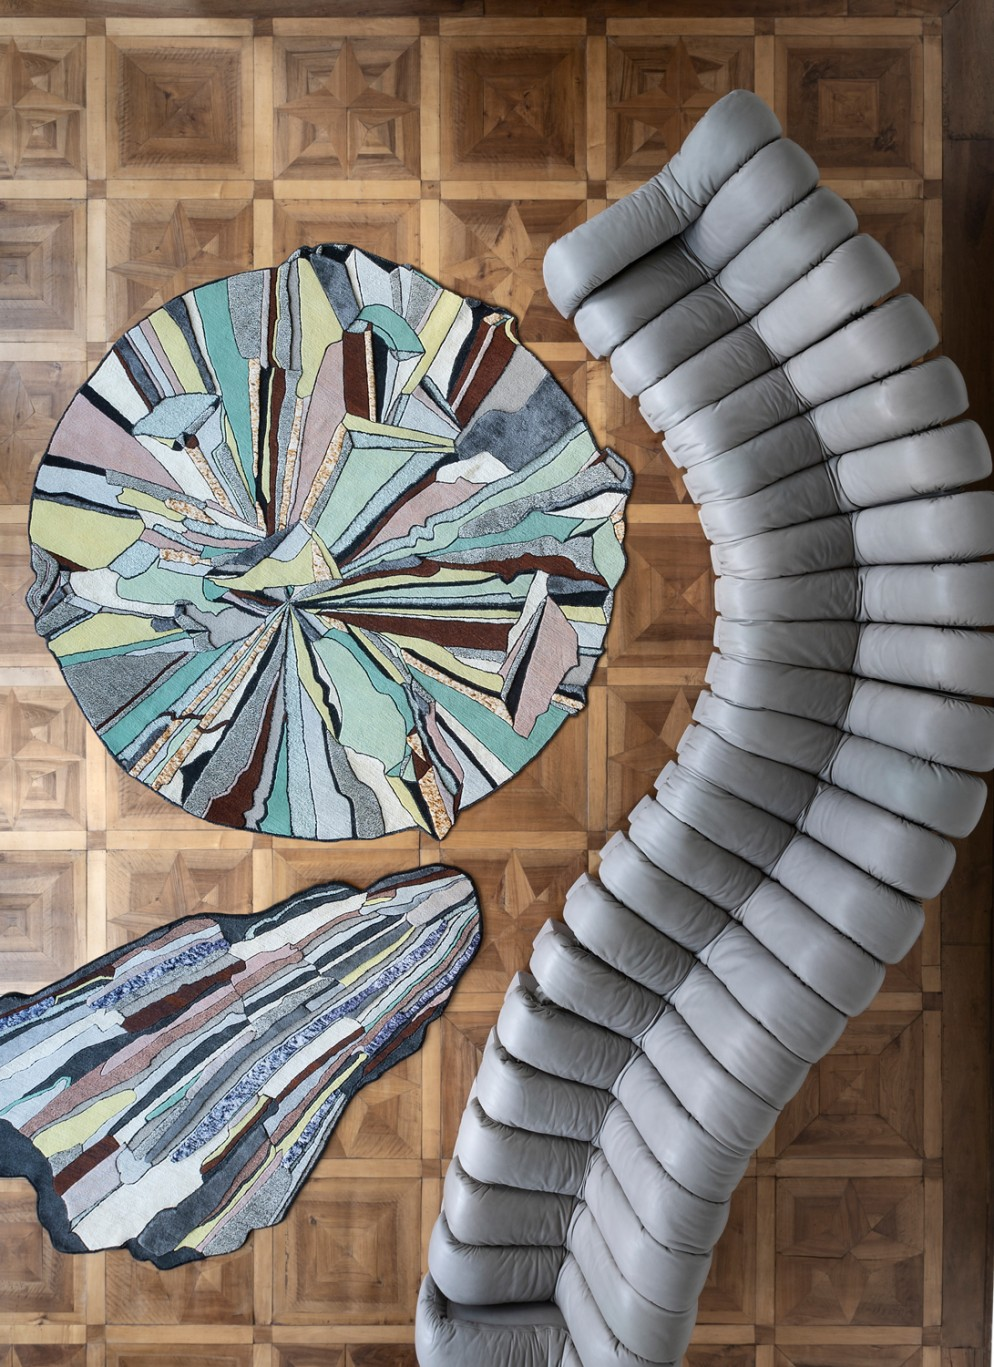 tappeti-moderni-forme-strane-Super-Fake-Collection-by-Bethan-Laura-Wood_Photo-Beppe-Brancato_Styling-Greta-Cevenini_3